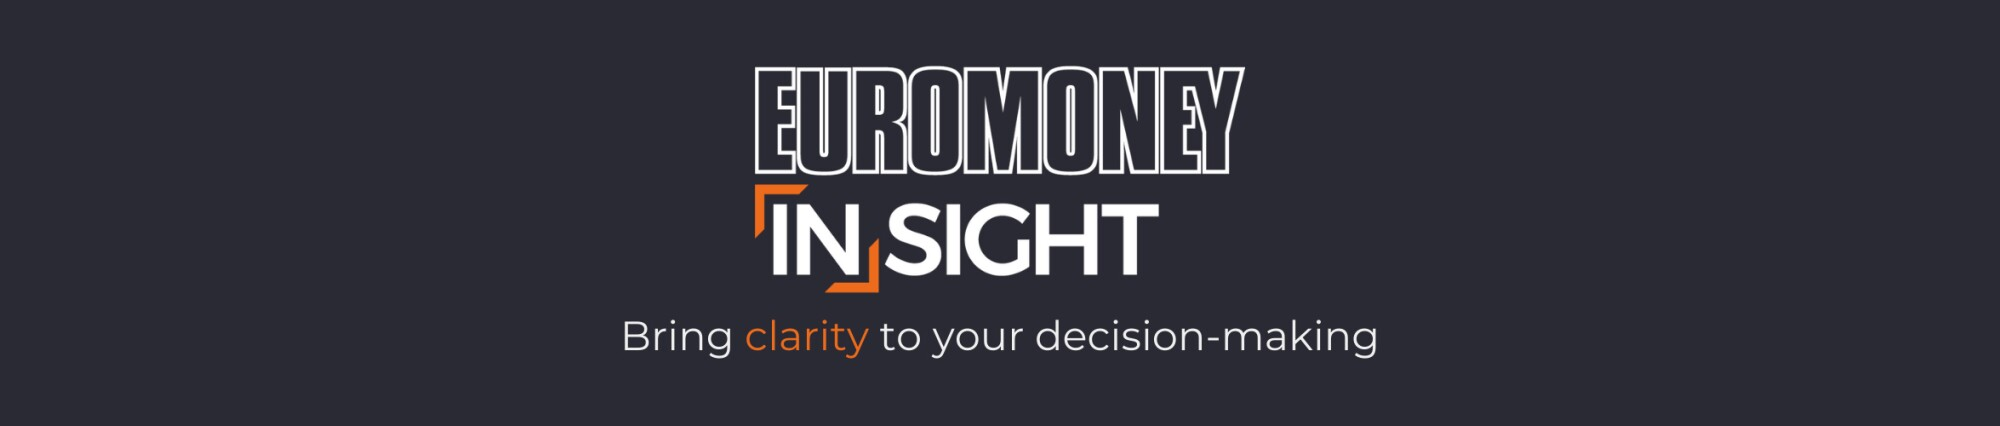 Euromoney Insight Landing Page header